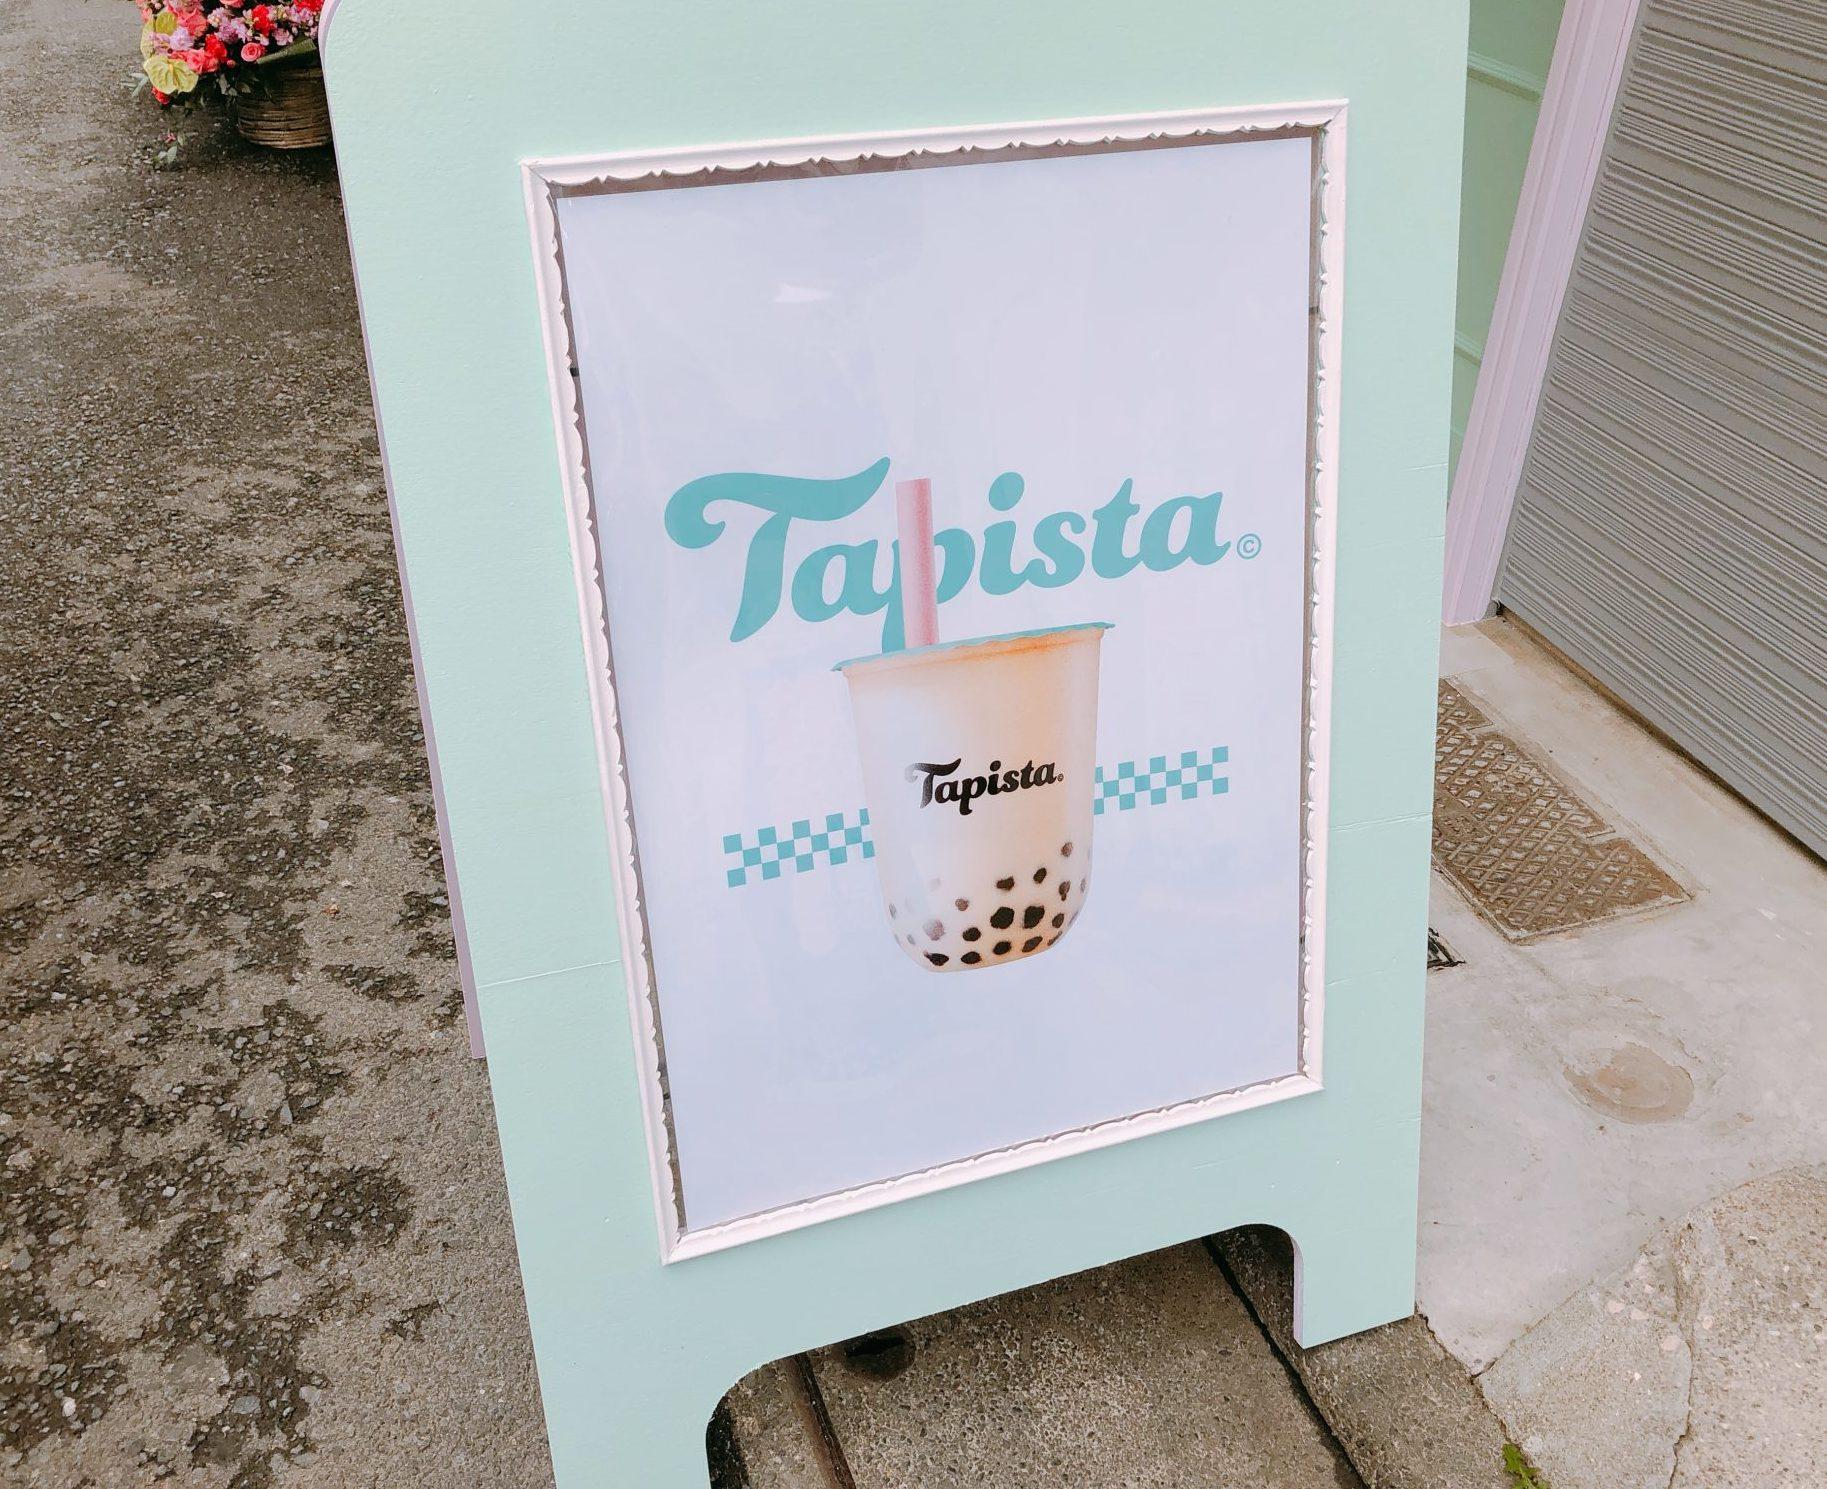 TAPISTA(タピスタ)の看板